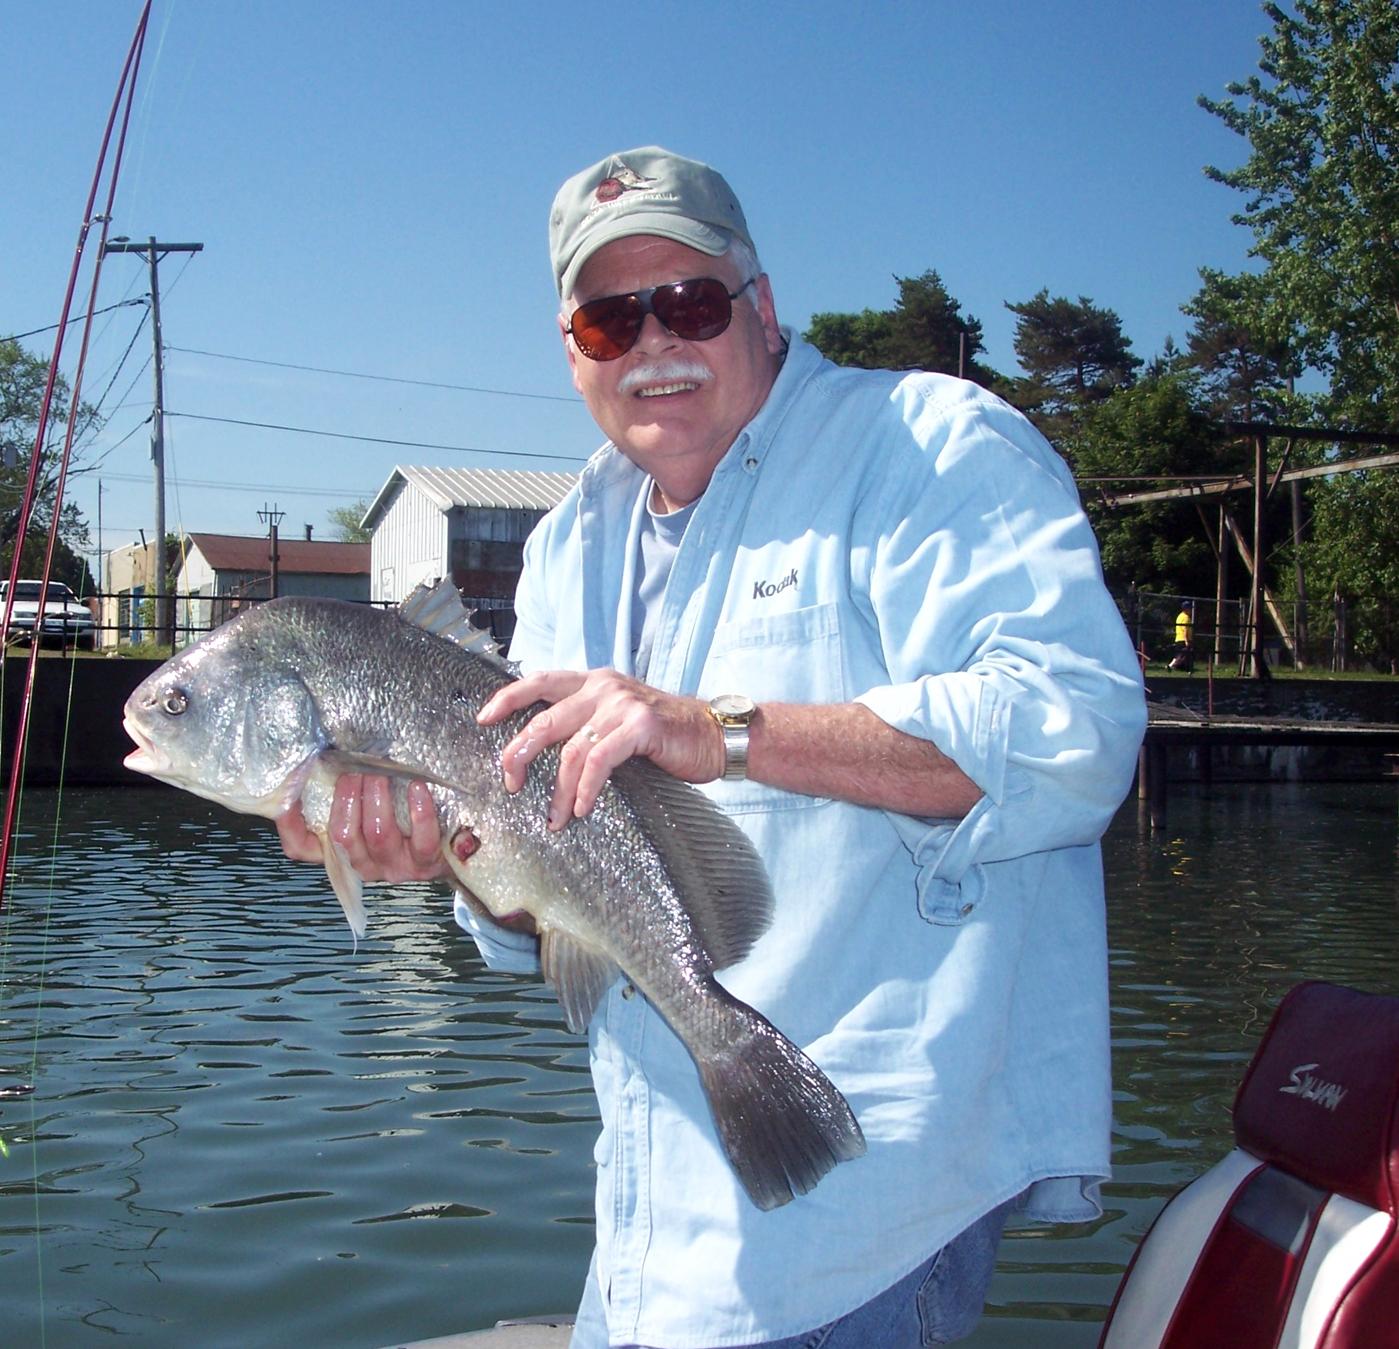 Tom Hickey, veteran of sixty years fishing Oneida Lake, with a handsome freshwater drum (sheepshead). Provided photo